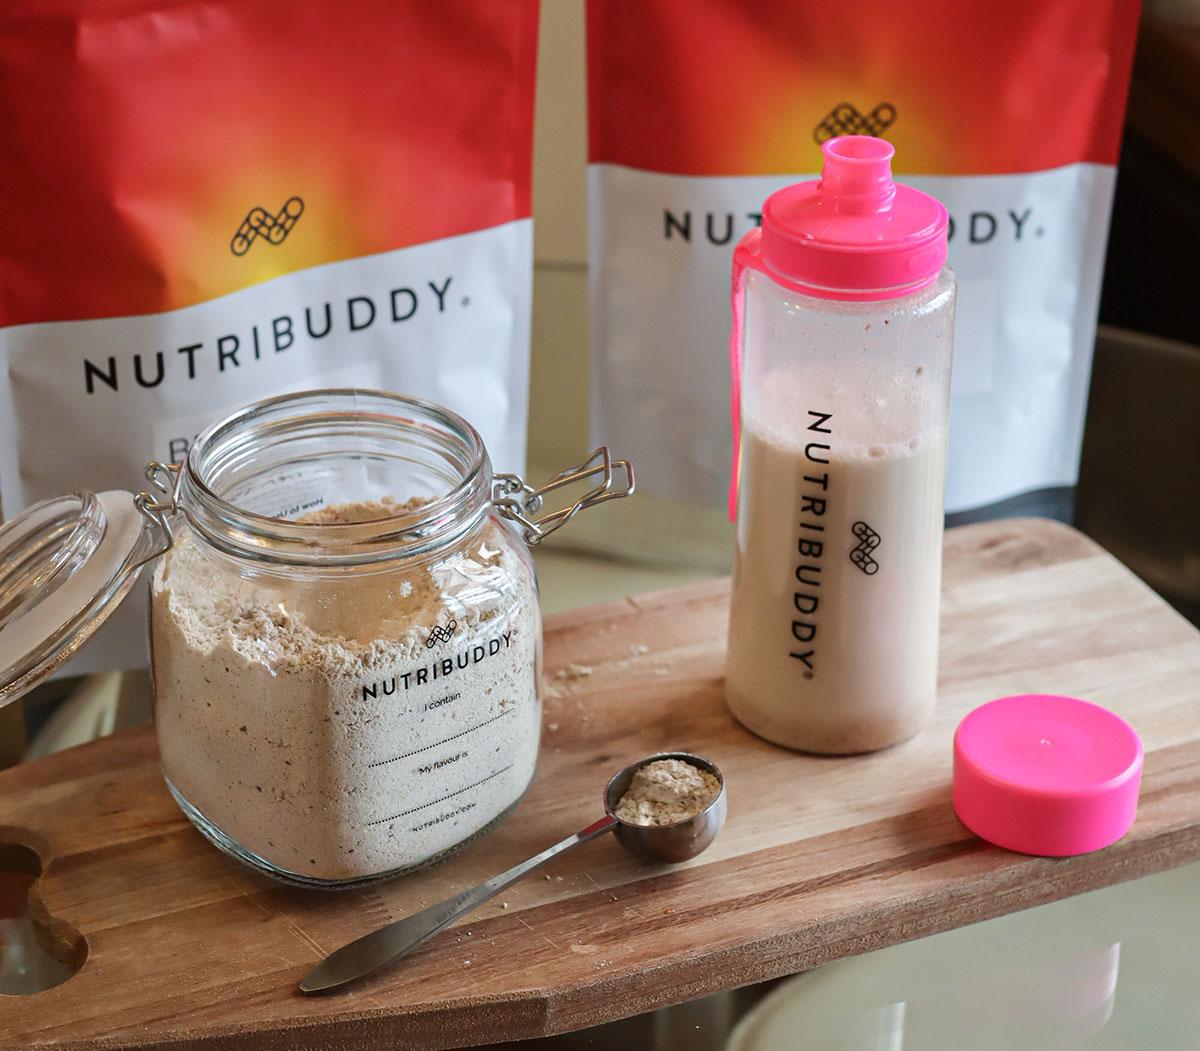 Nutribuddy products by StylebyDeb